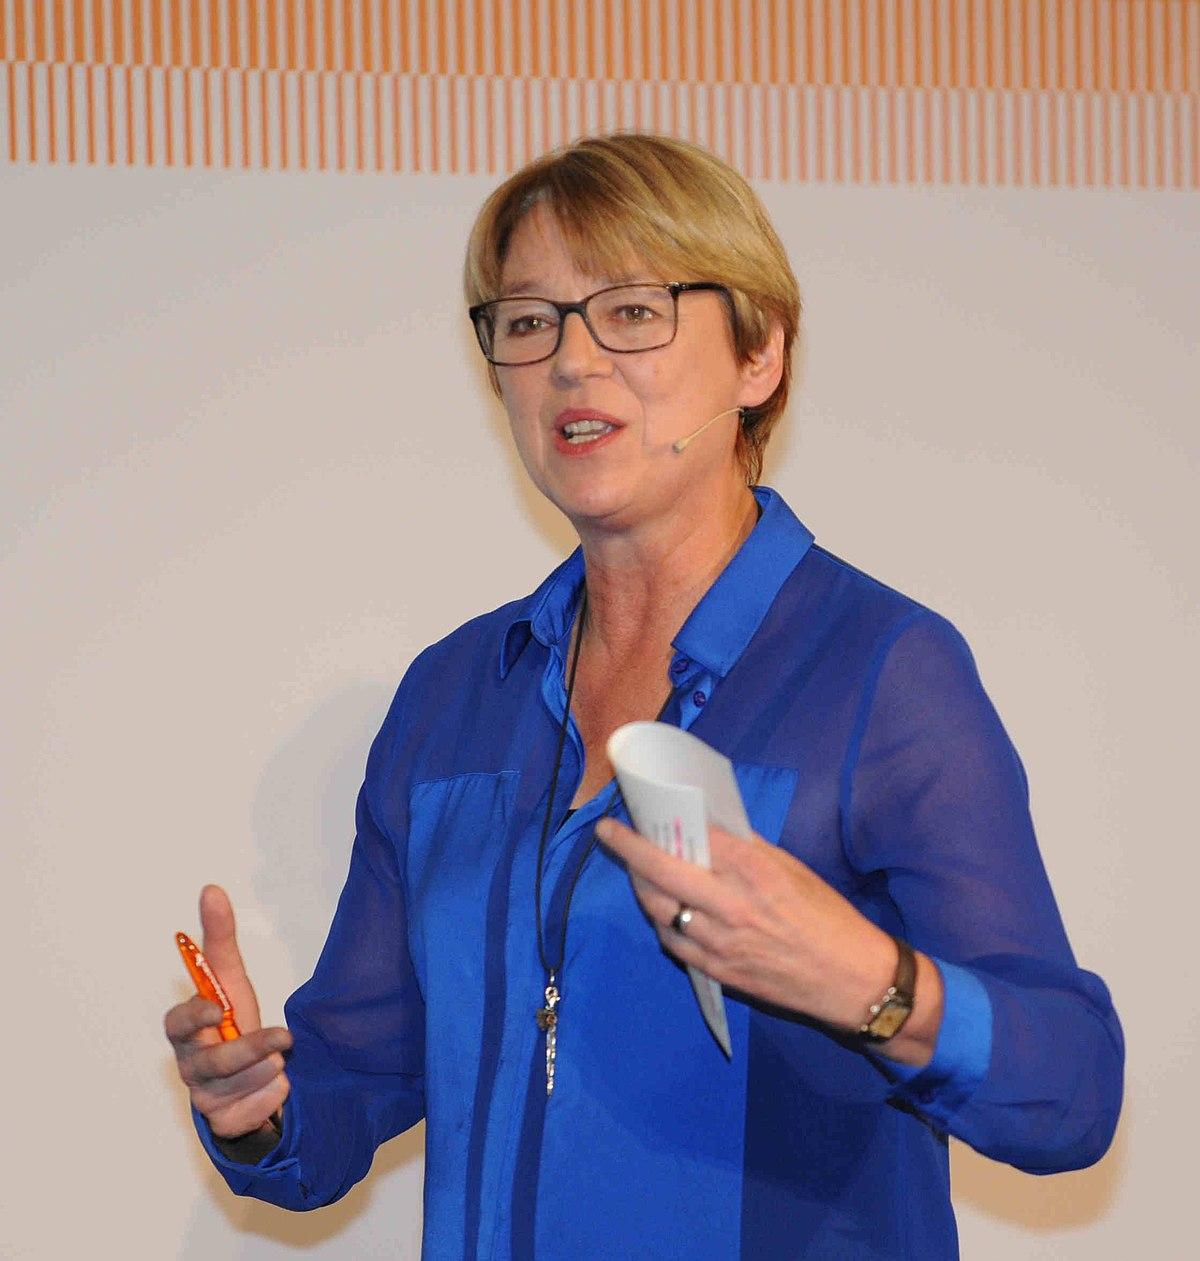 Judith Schulte-Loh